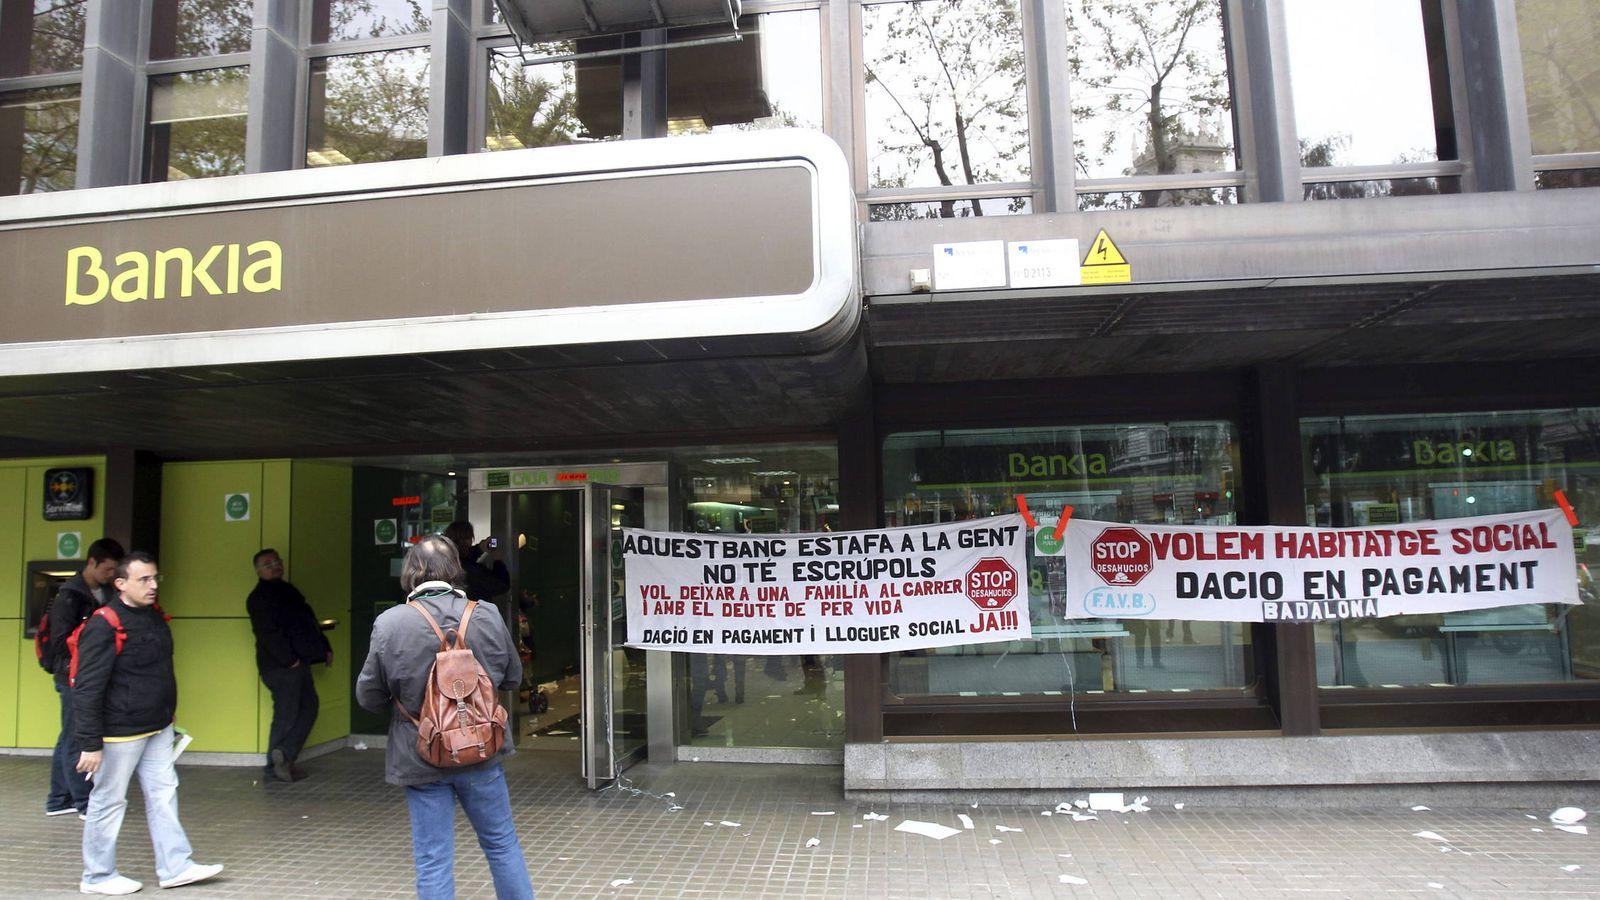 Noticias de bankia condenan a bankia por imponer for Bankia oficina de internet